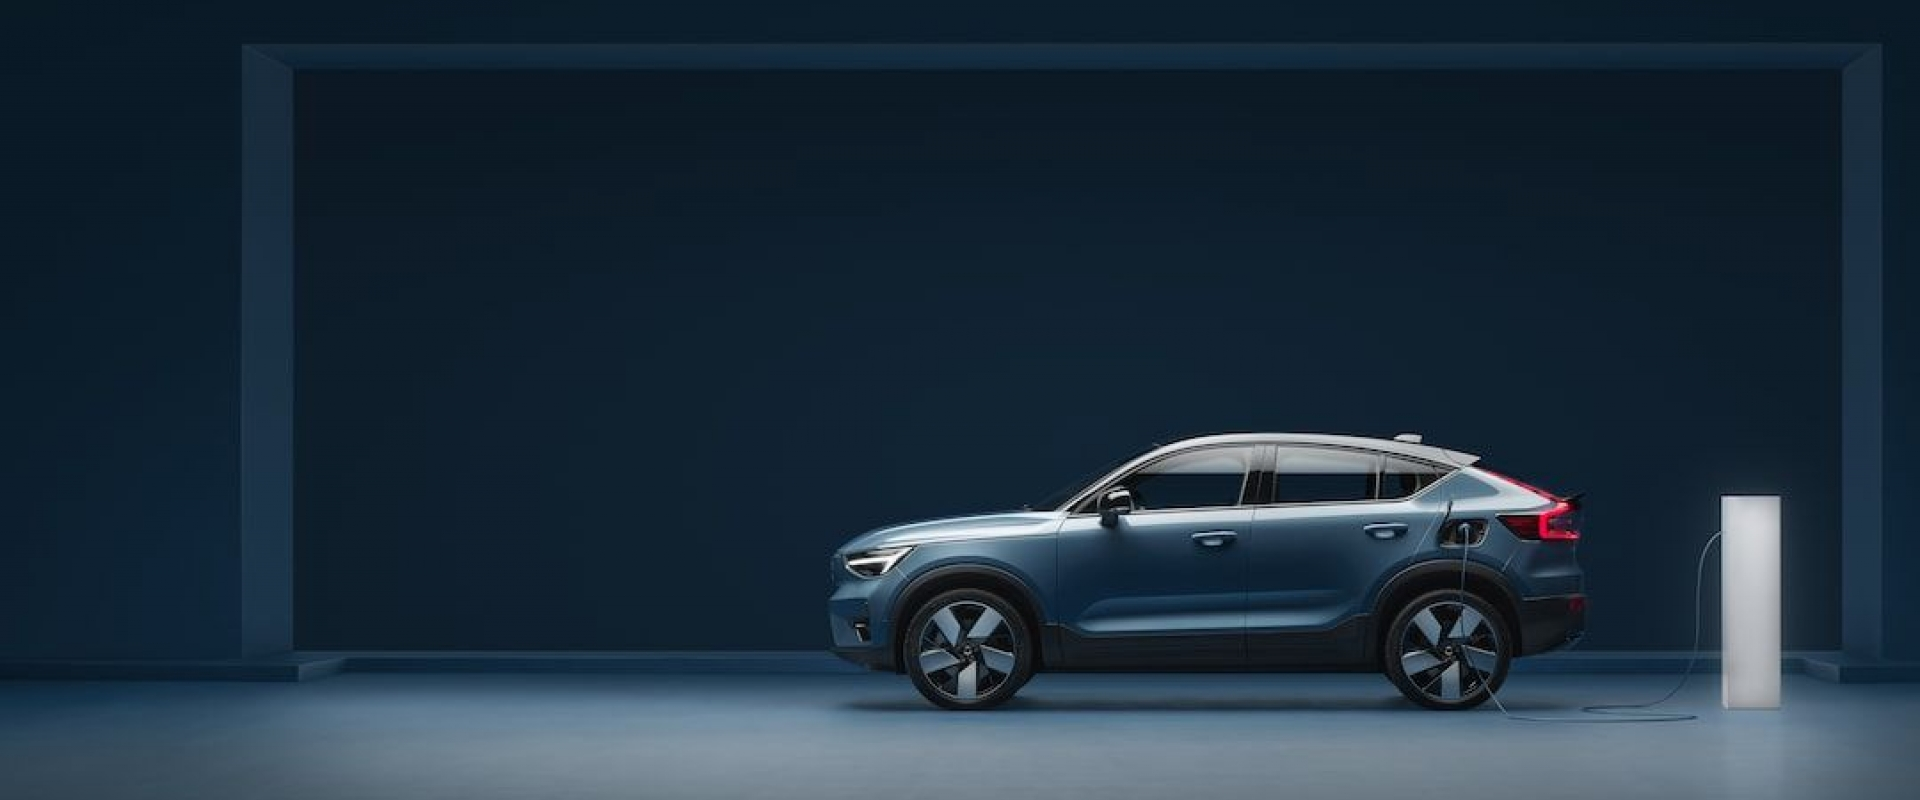 Photo d'un véhicule Volvo C40